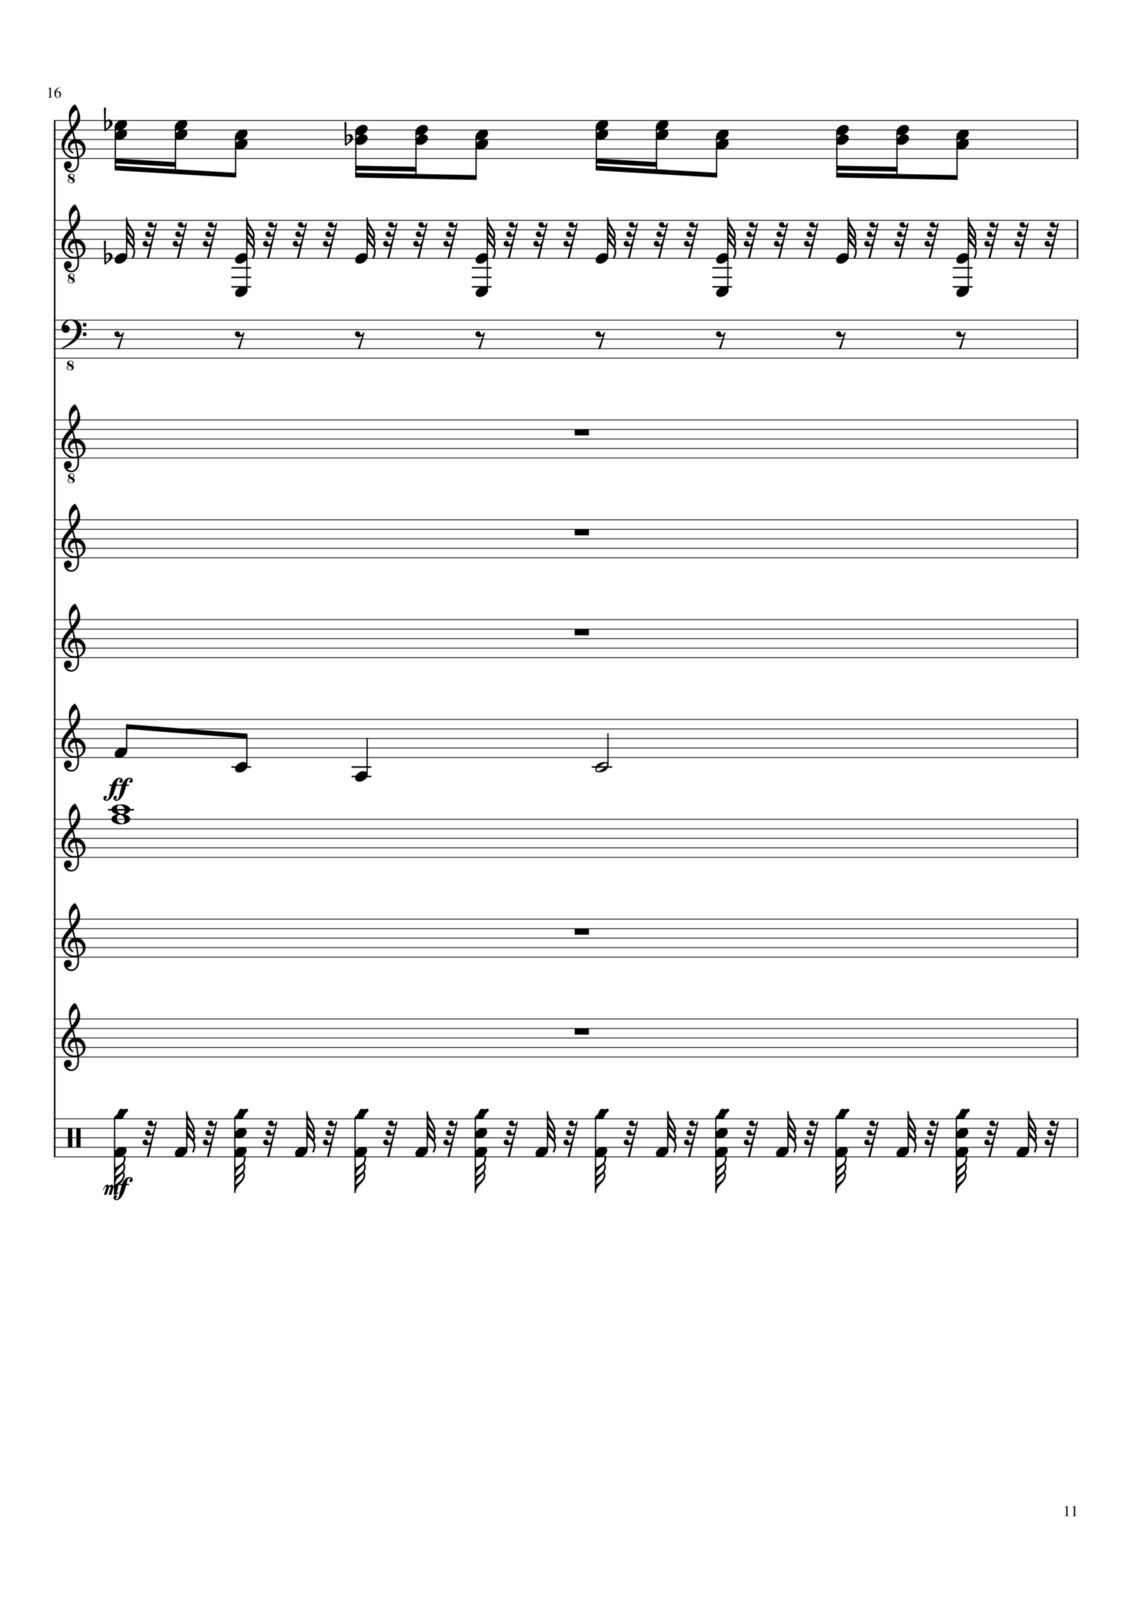 Belyiy sokol slide, Image 11